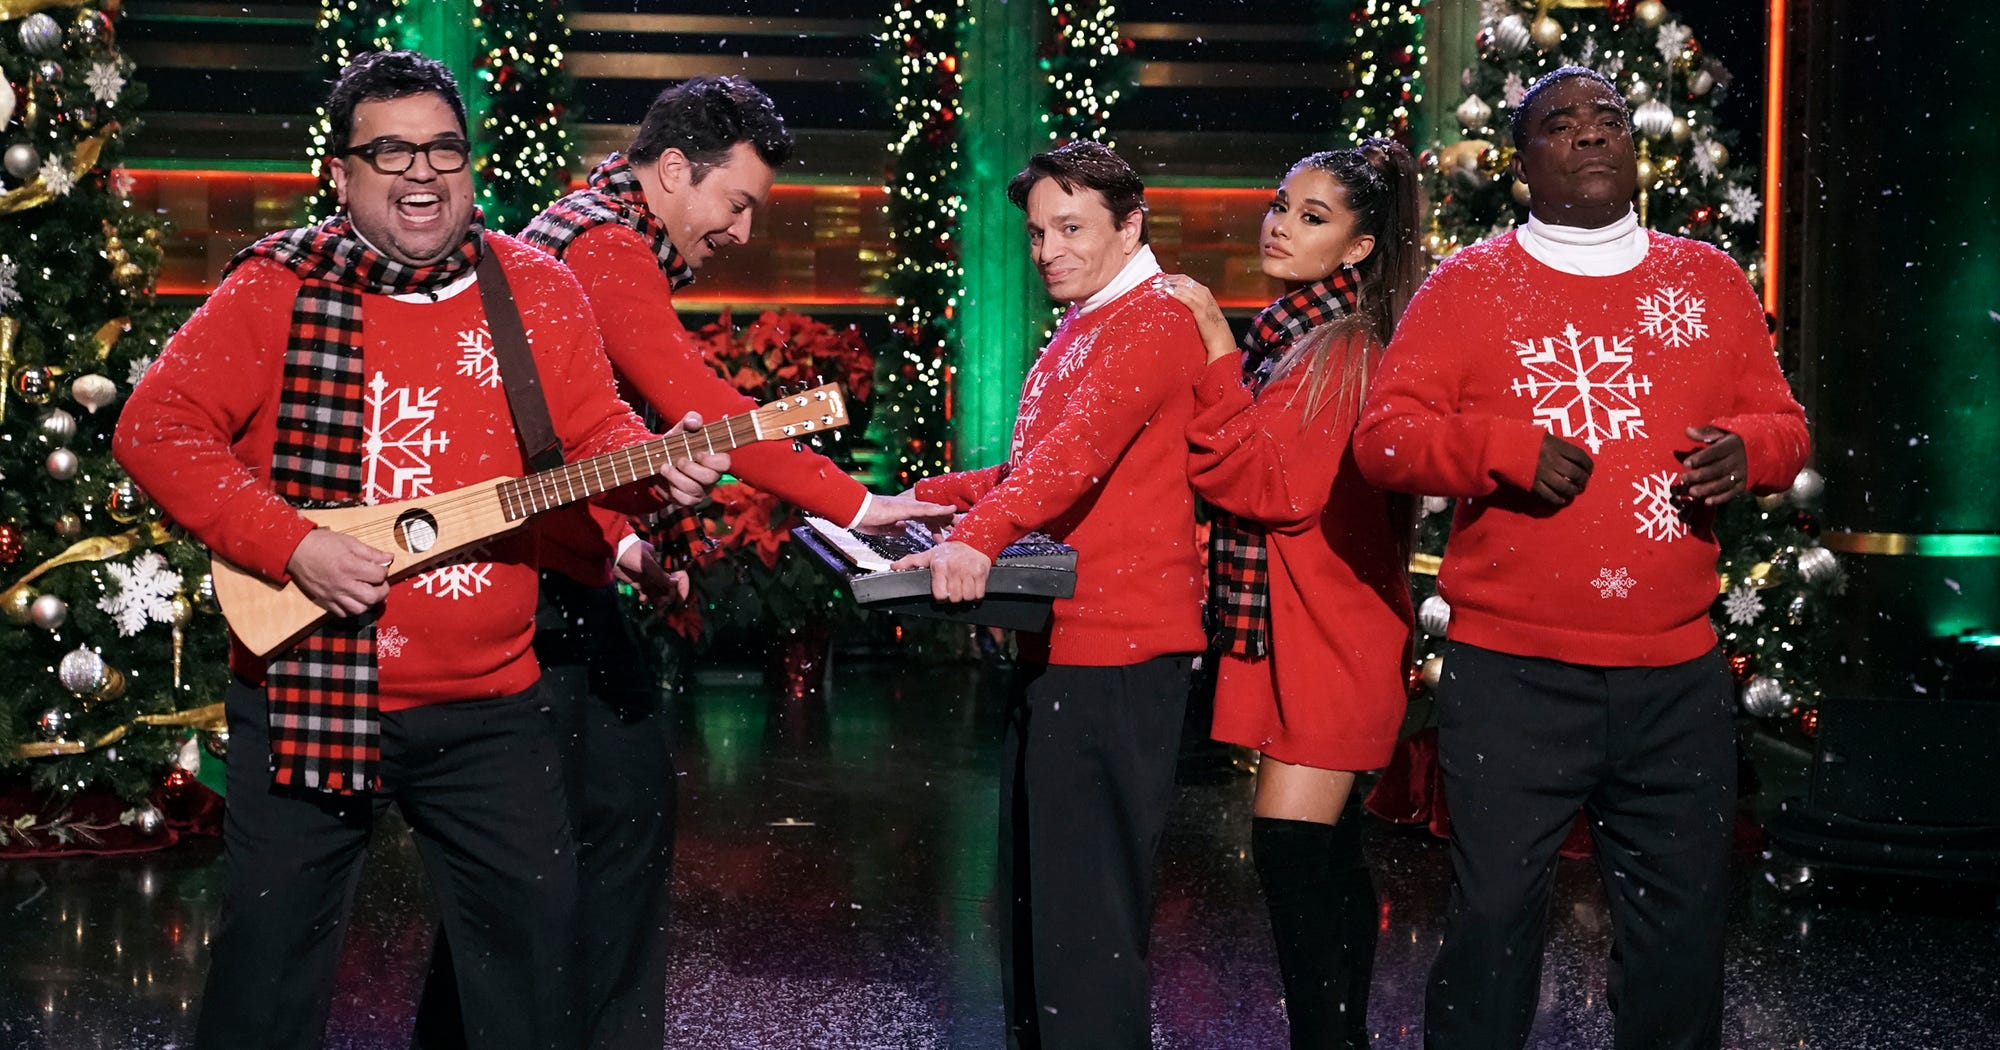 Ariana Grande Jimmy Fallon Recreate Christmas SNL Skit